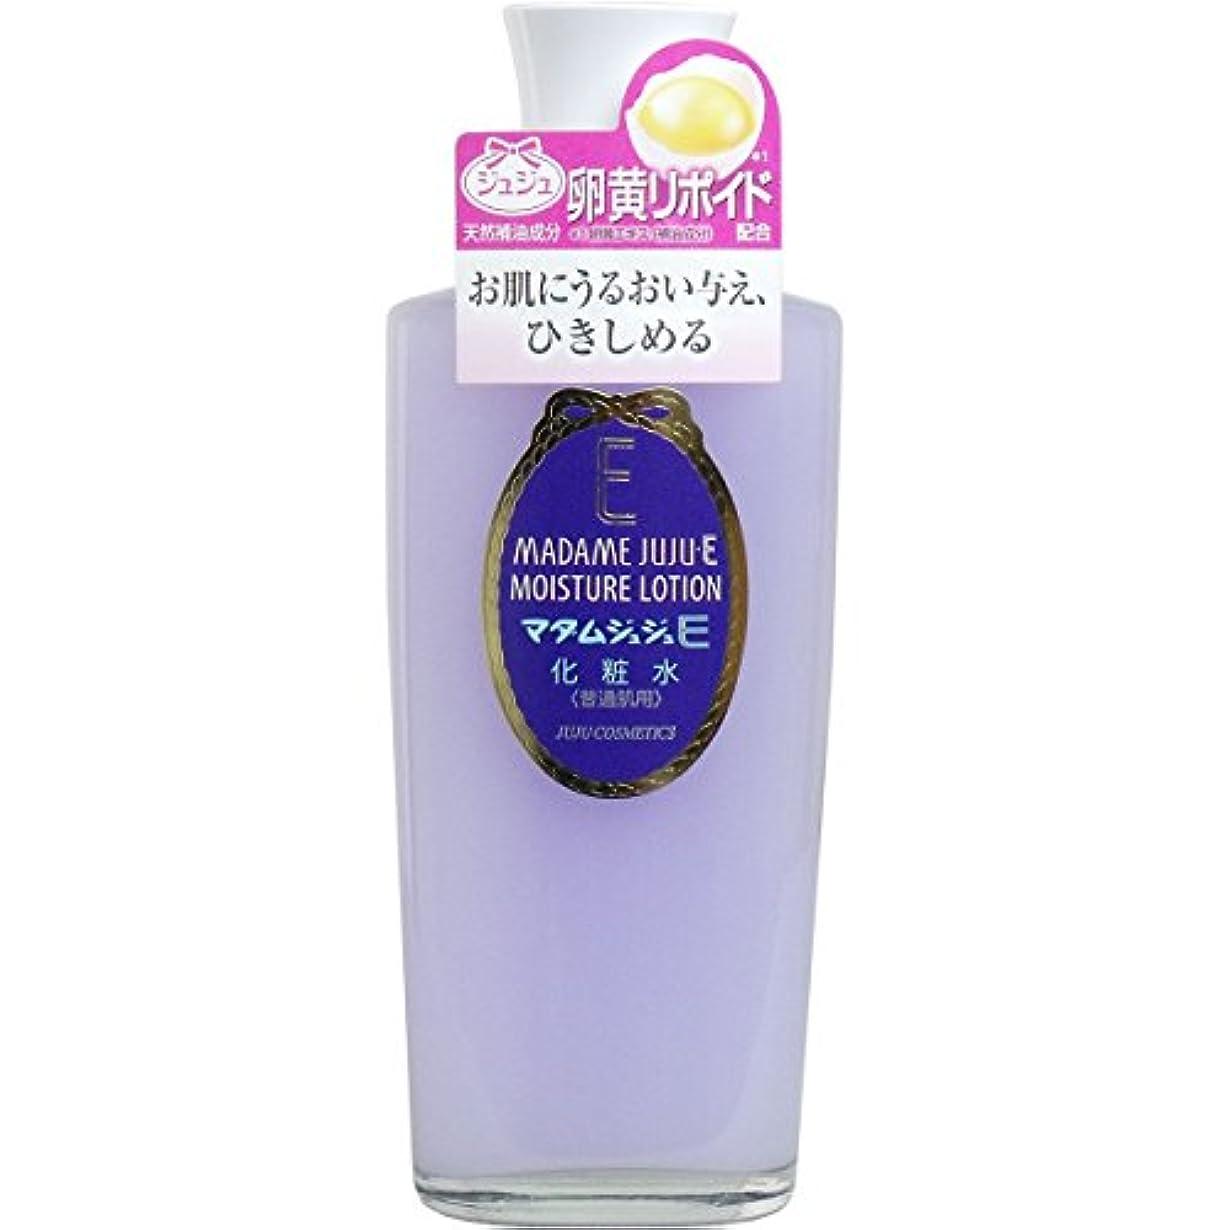 モデレータ一緒ブラジャー【ジュジュ化粧品】マダムジュジュE 化粧水 150ml